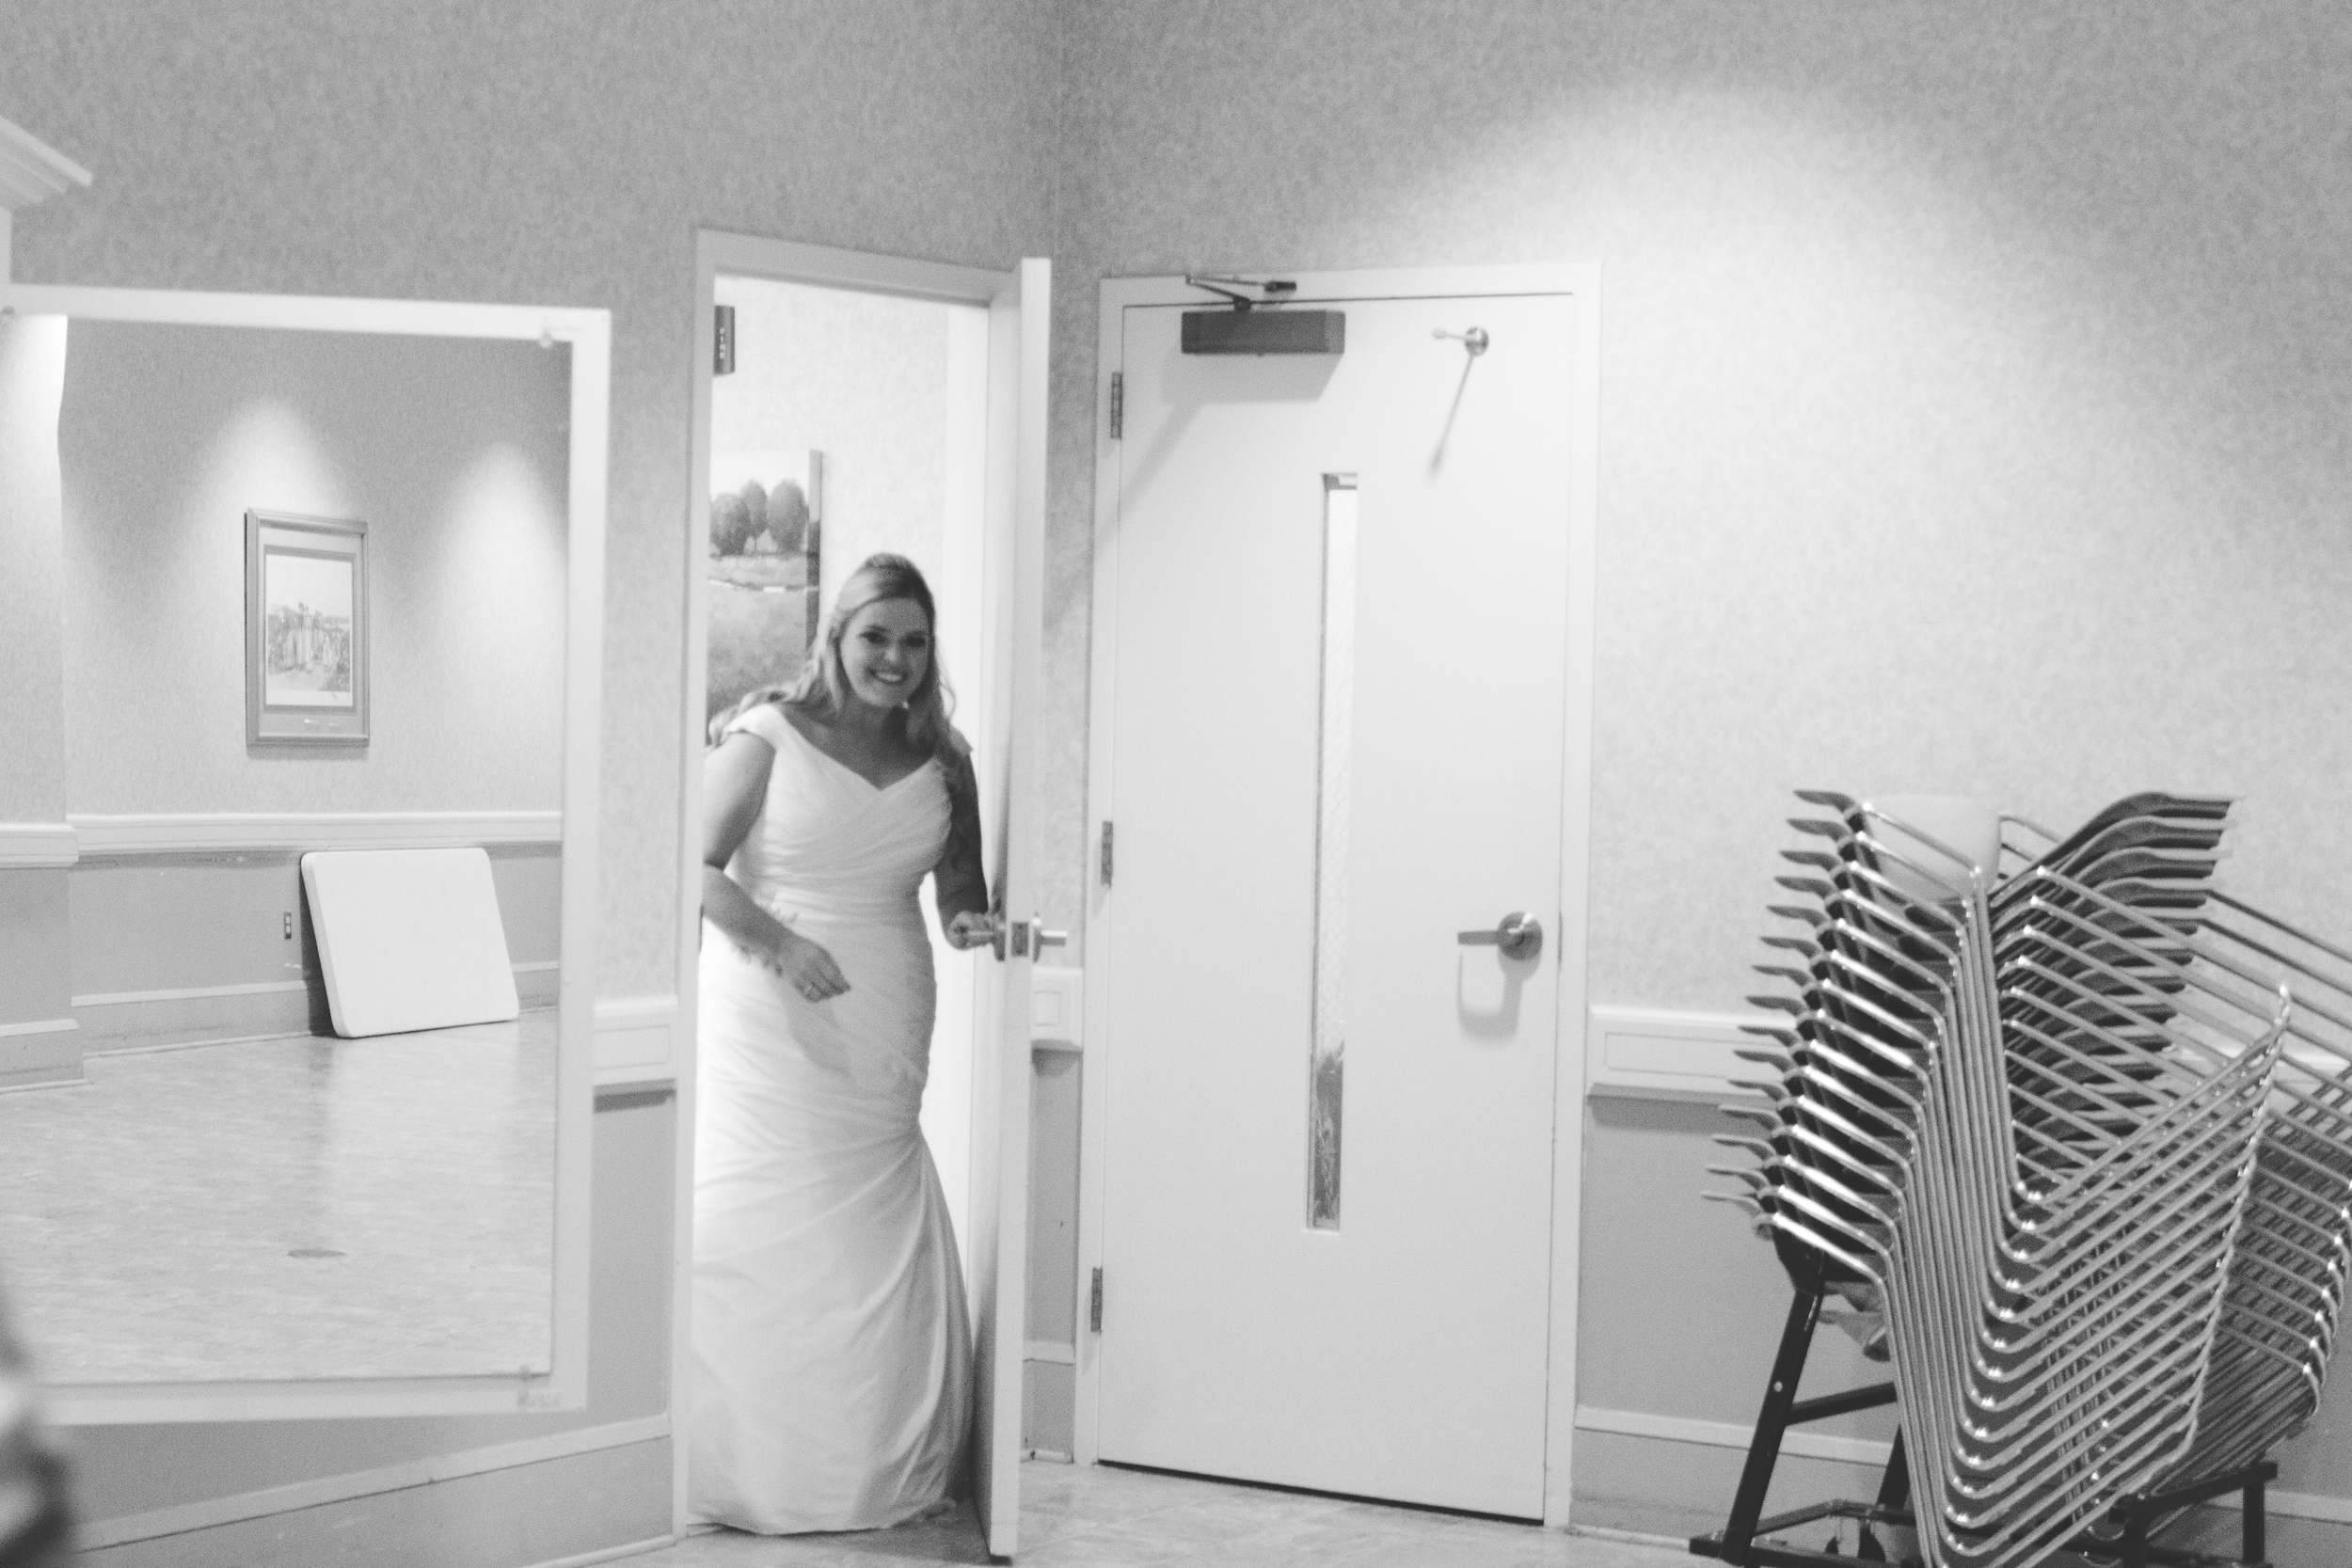 Hough_Wedding_North_Carolina_Charlotte_JonCourvillePhotography-78.jpg